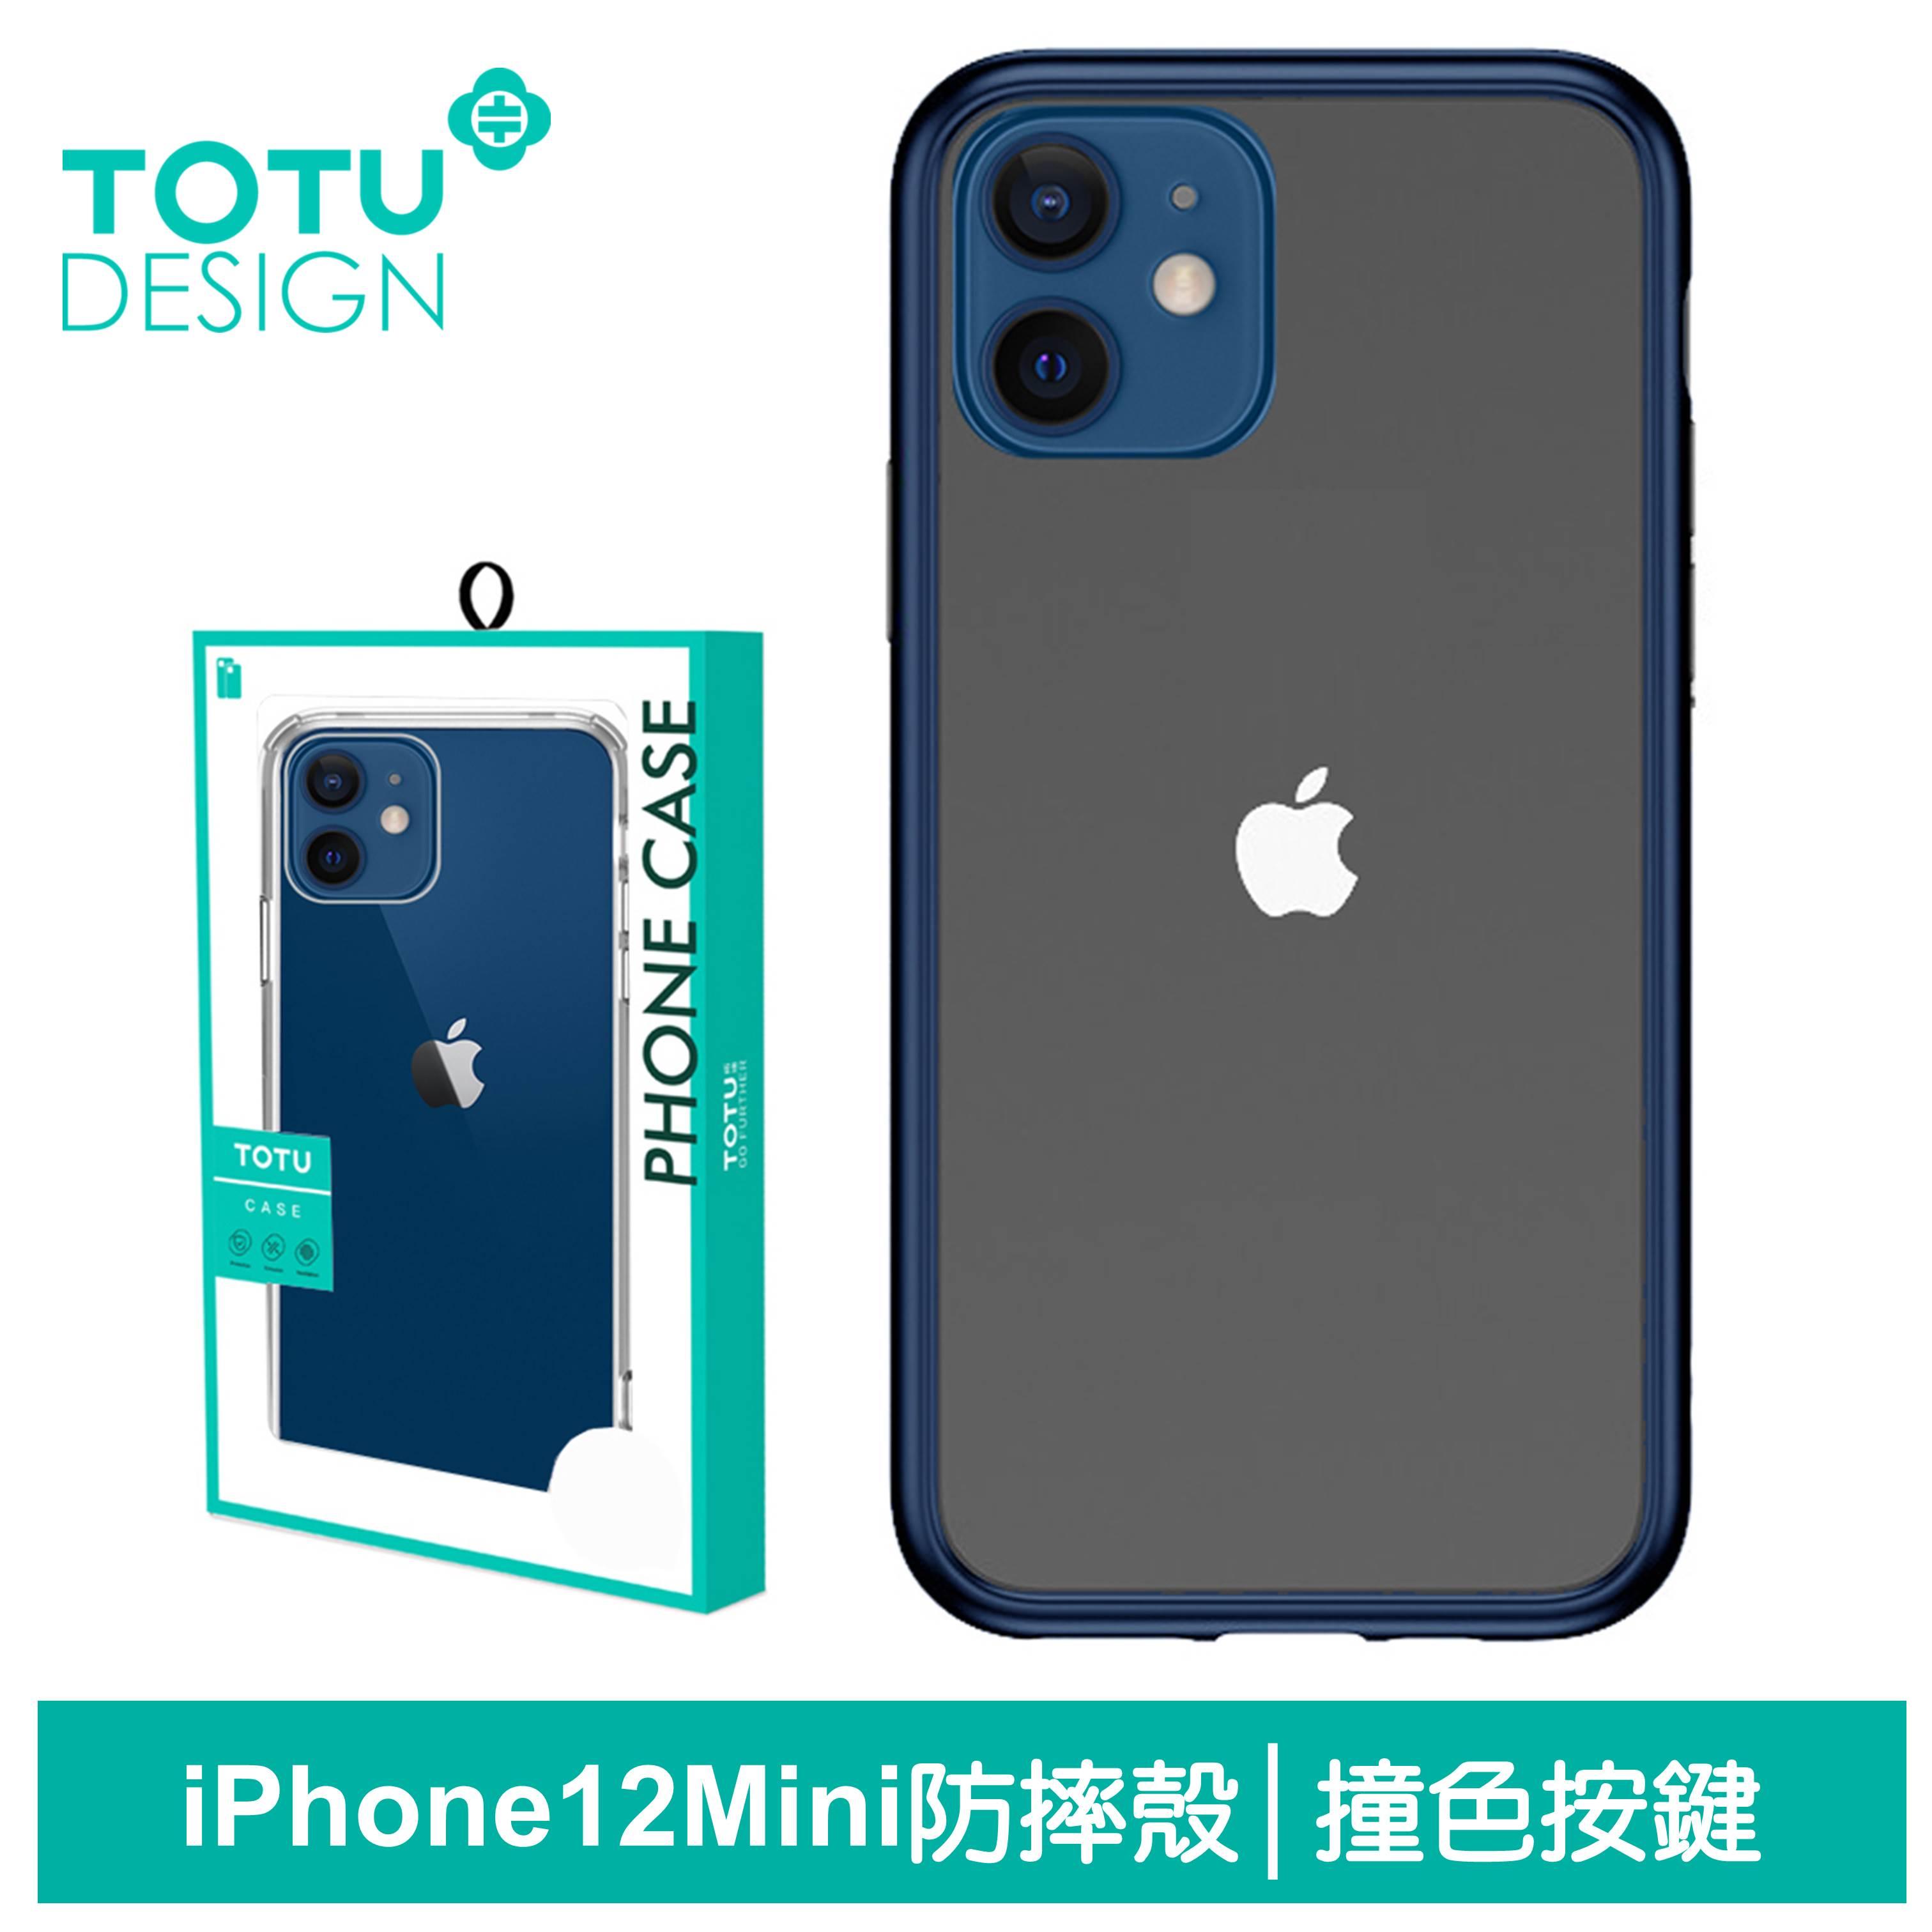 TOTU台灣官方 iPhone 12 Mini 手機殼 i12 Mini 保護殼 5.4吋 防摔殼 撞色按鍵 晶剛系列 藍色